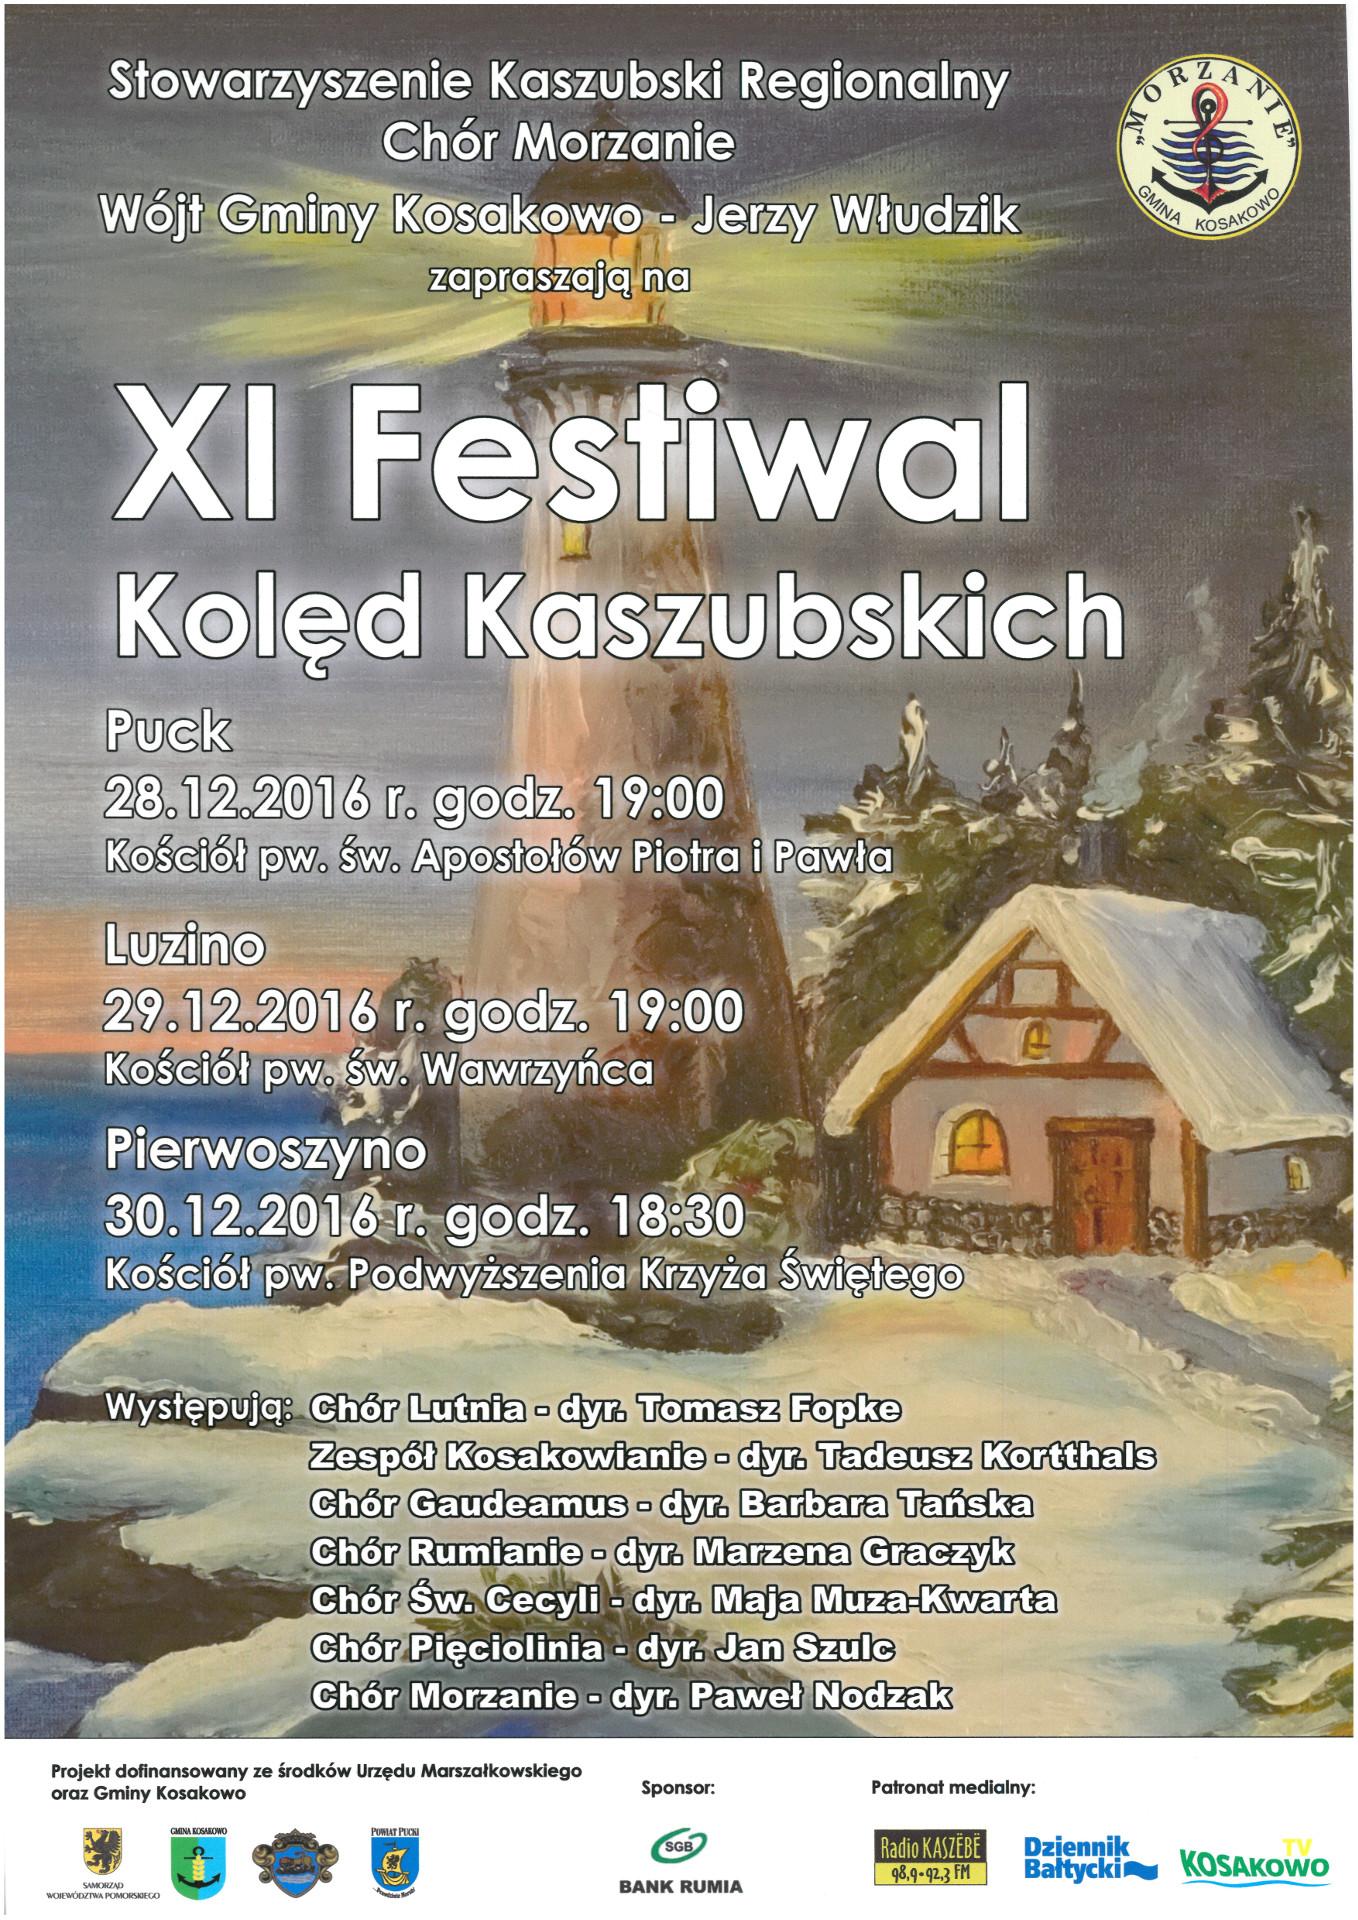 xi-festiwal-koled-kaszubskich-1